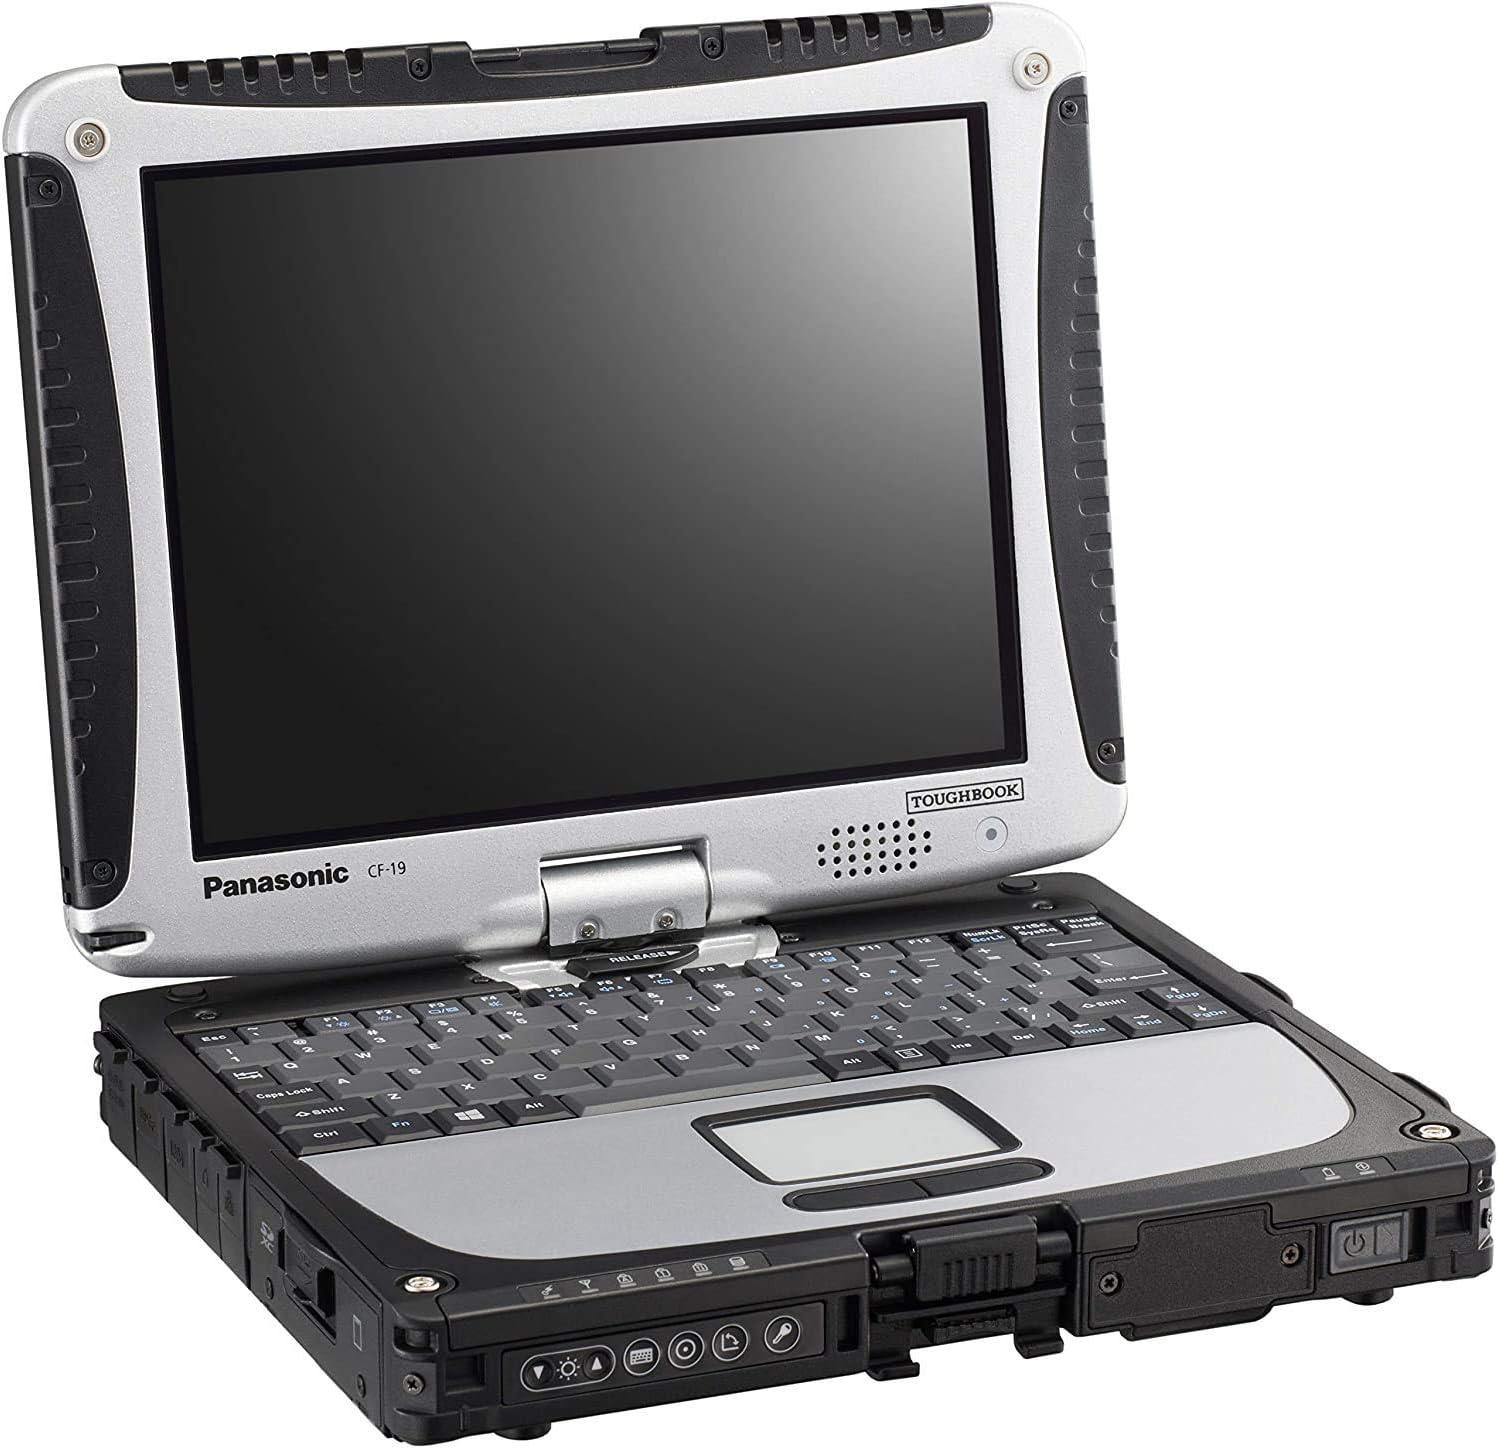 Panasonic Toughbook CF-19 MK4, Intel i5-U540 @1.20GHz, 10.4